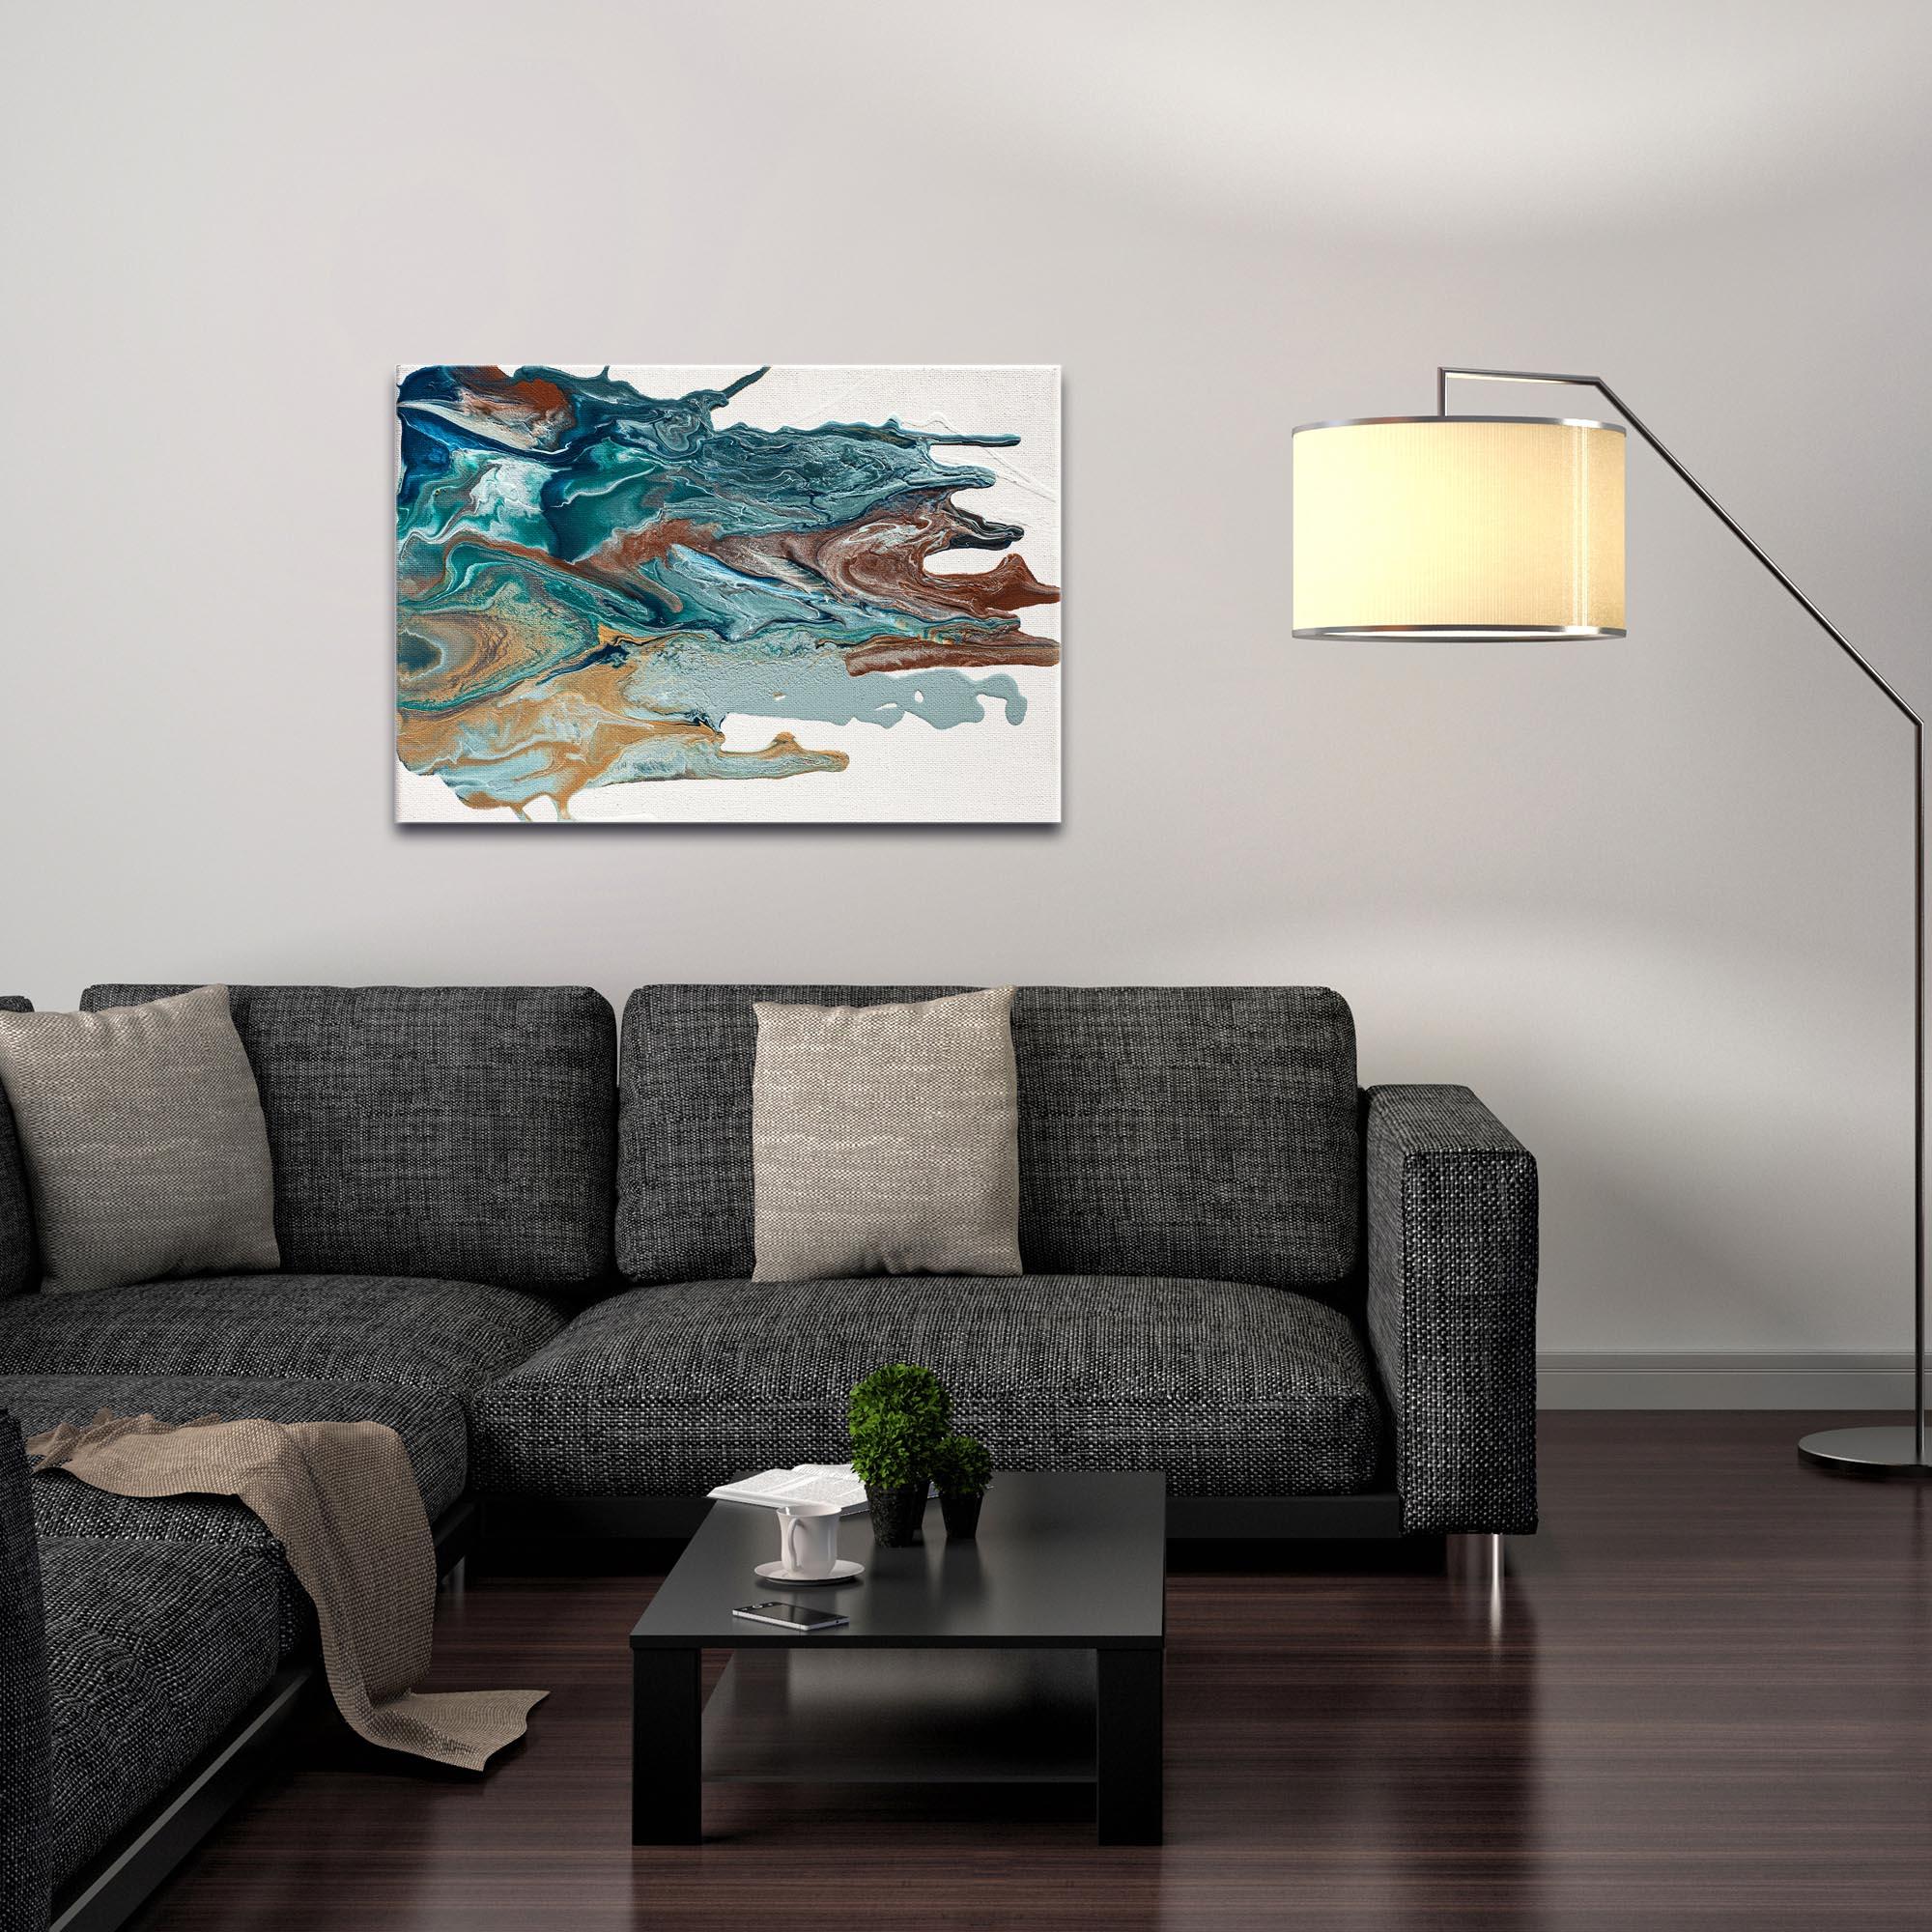 Abstract Wall Art 'Earth 1' - Urban Splatter Decor on Metal or Plexiglass - Image 3